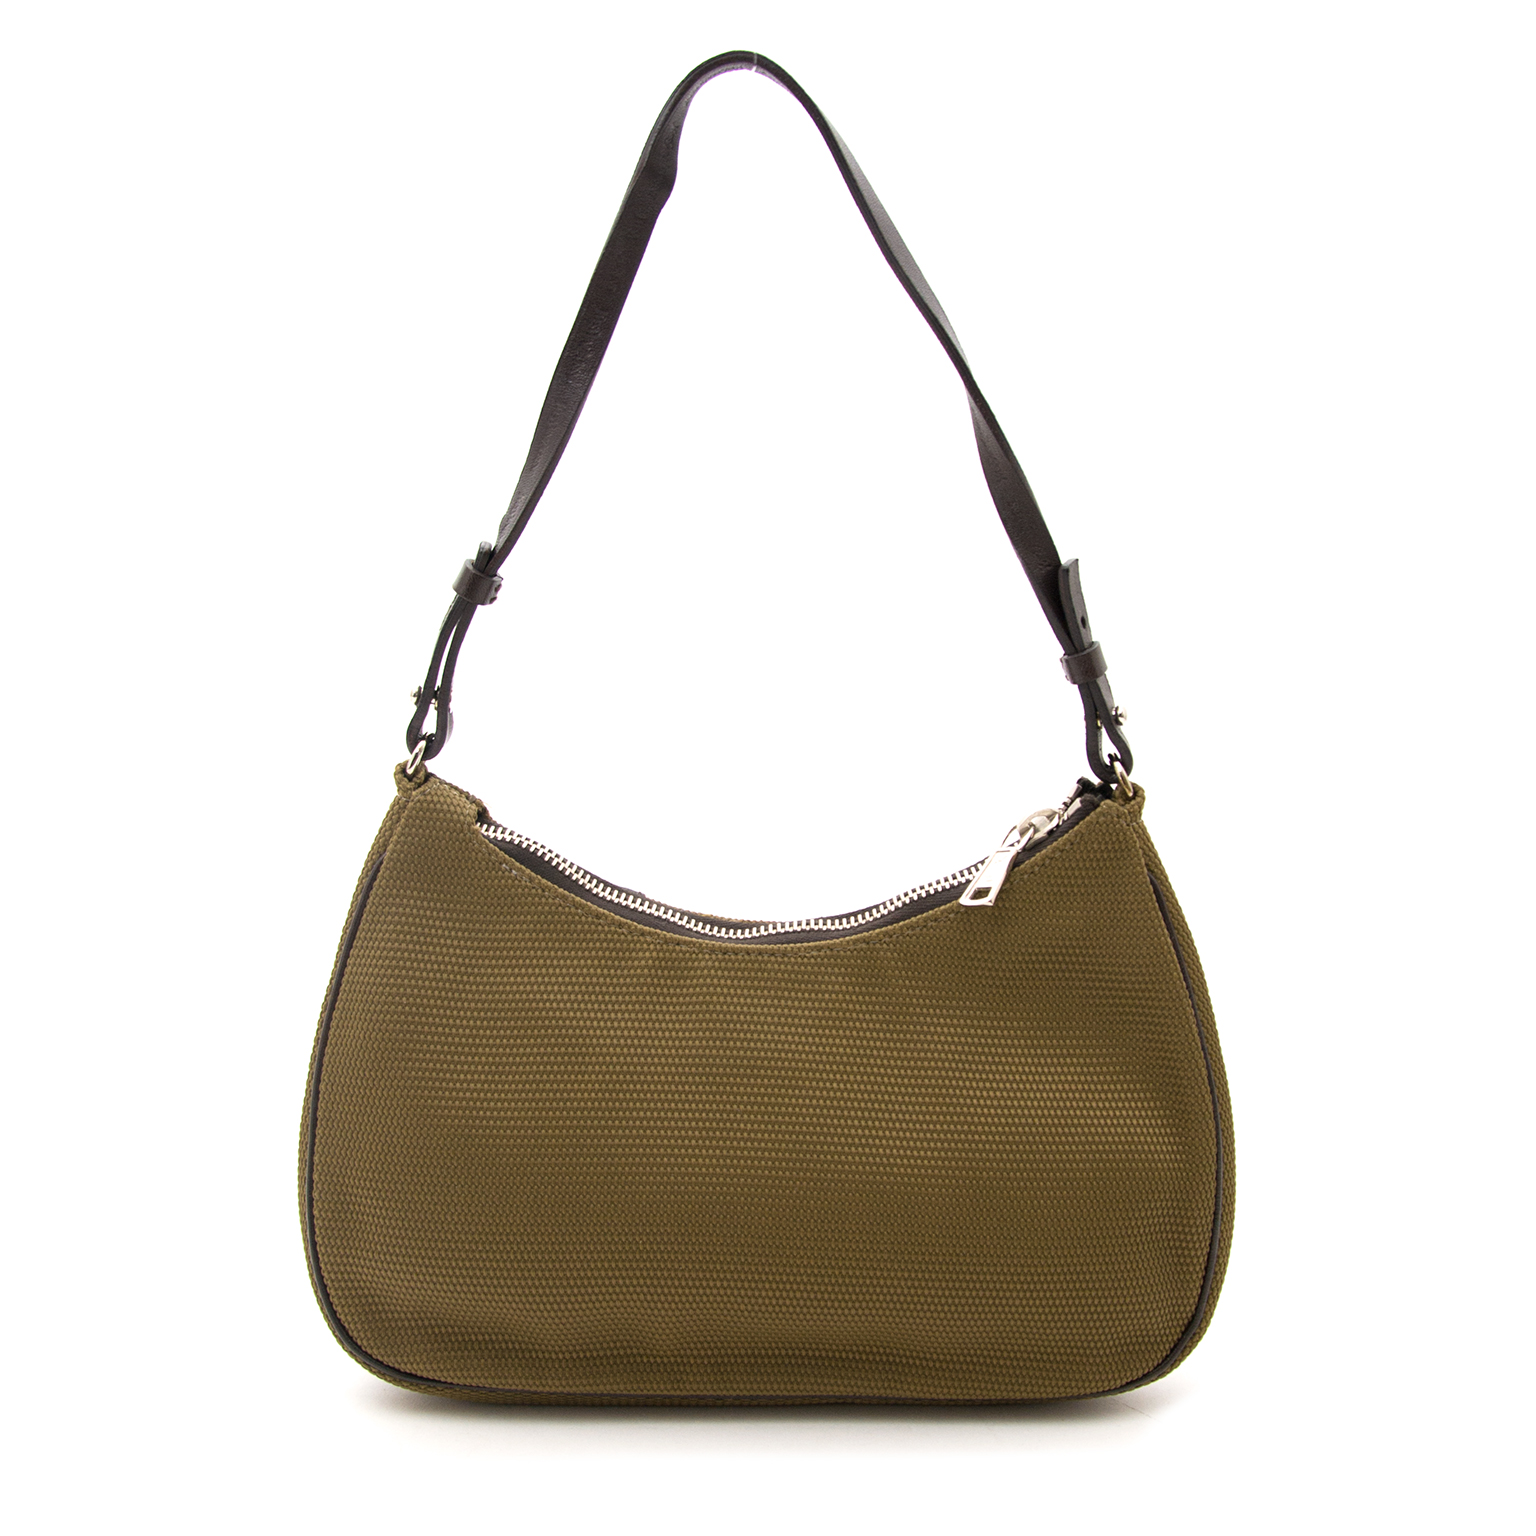 Buy your Yves Saint Laurent Khaki Nylon Bag for the best price available online.